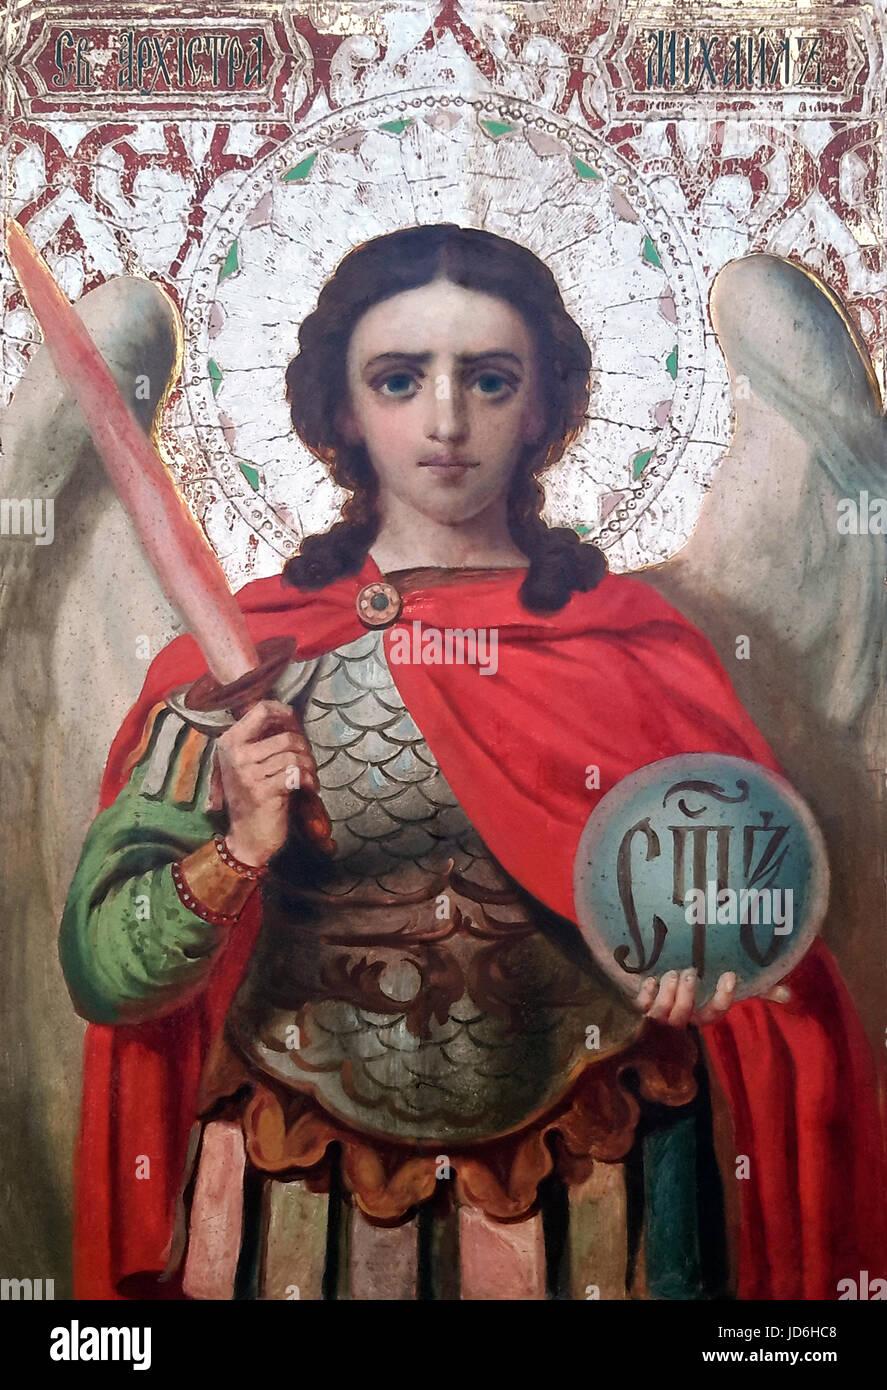 Archangel Saint Michael. Guardian of Paradise. Church iconography - Stock Image